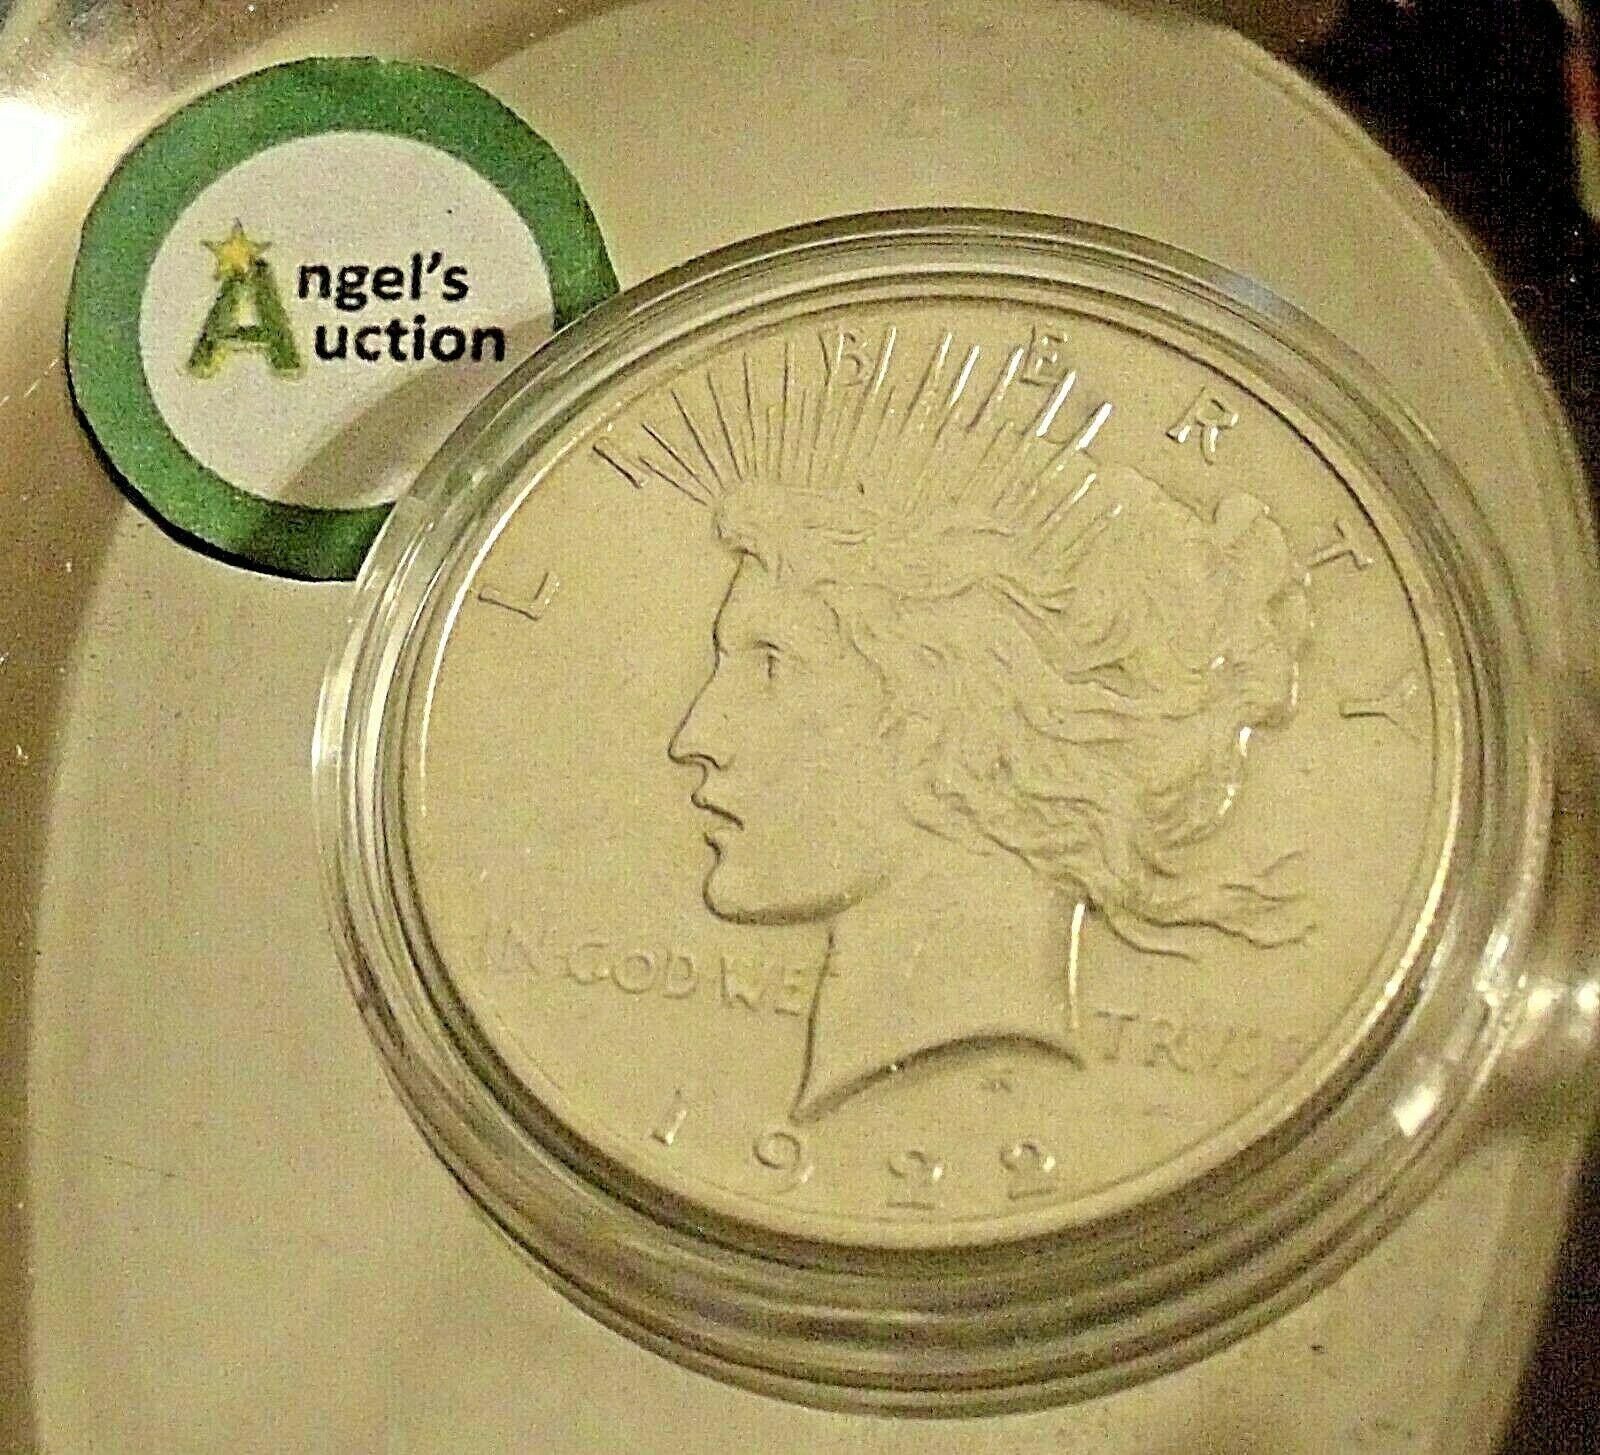 Uncirculated Liberty Peace Silver Dollar 1922 AA20-CND7008